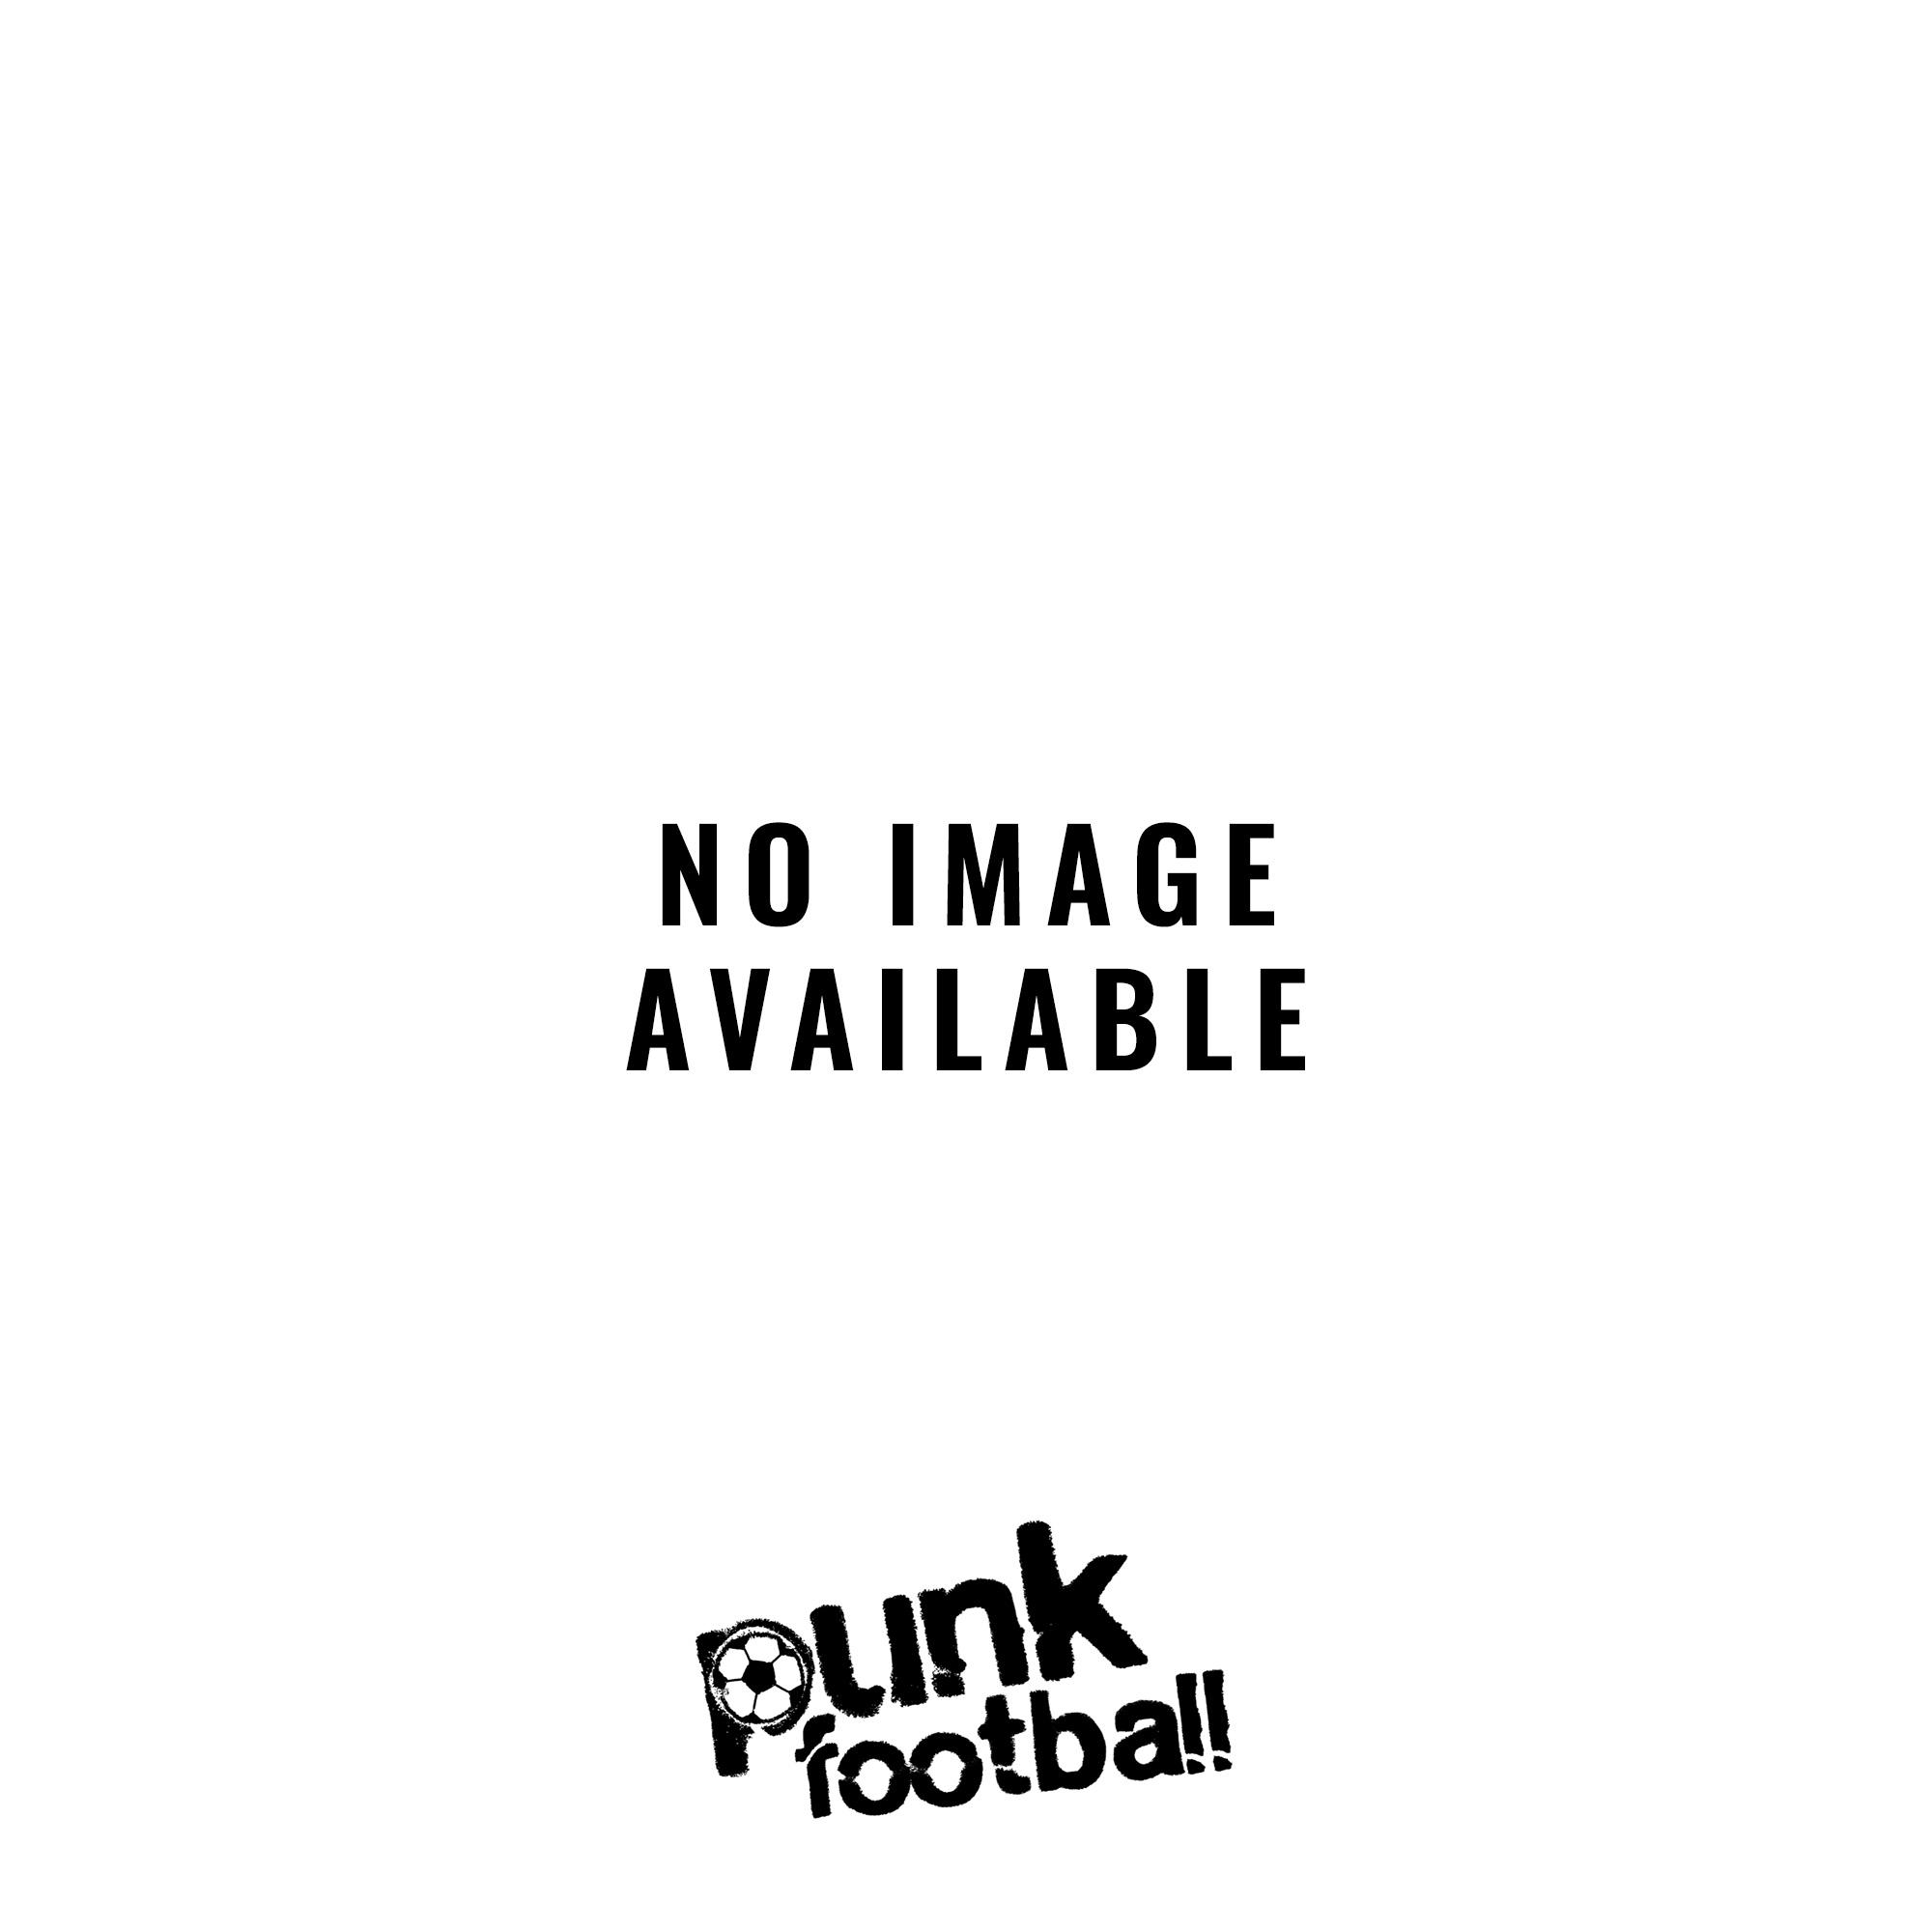 The North East (Newcastle United) Hooded Sweatshirt